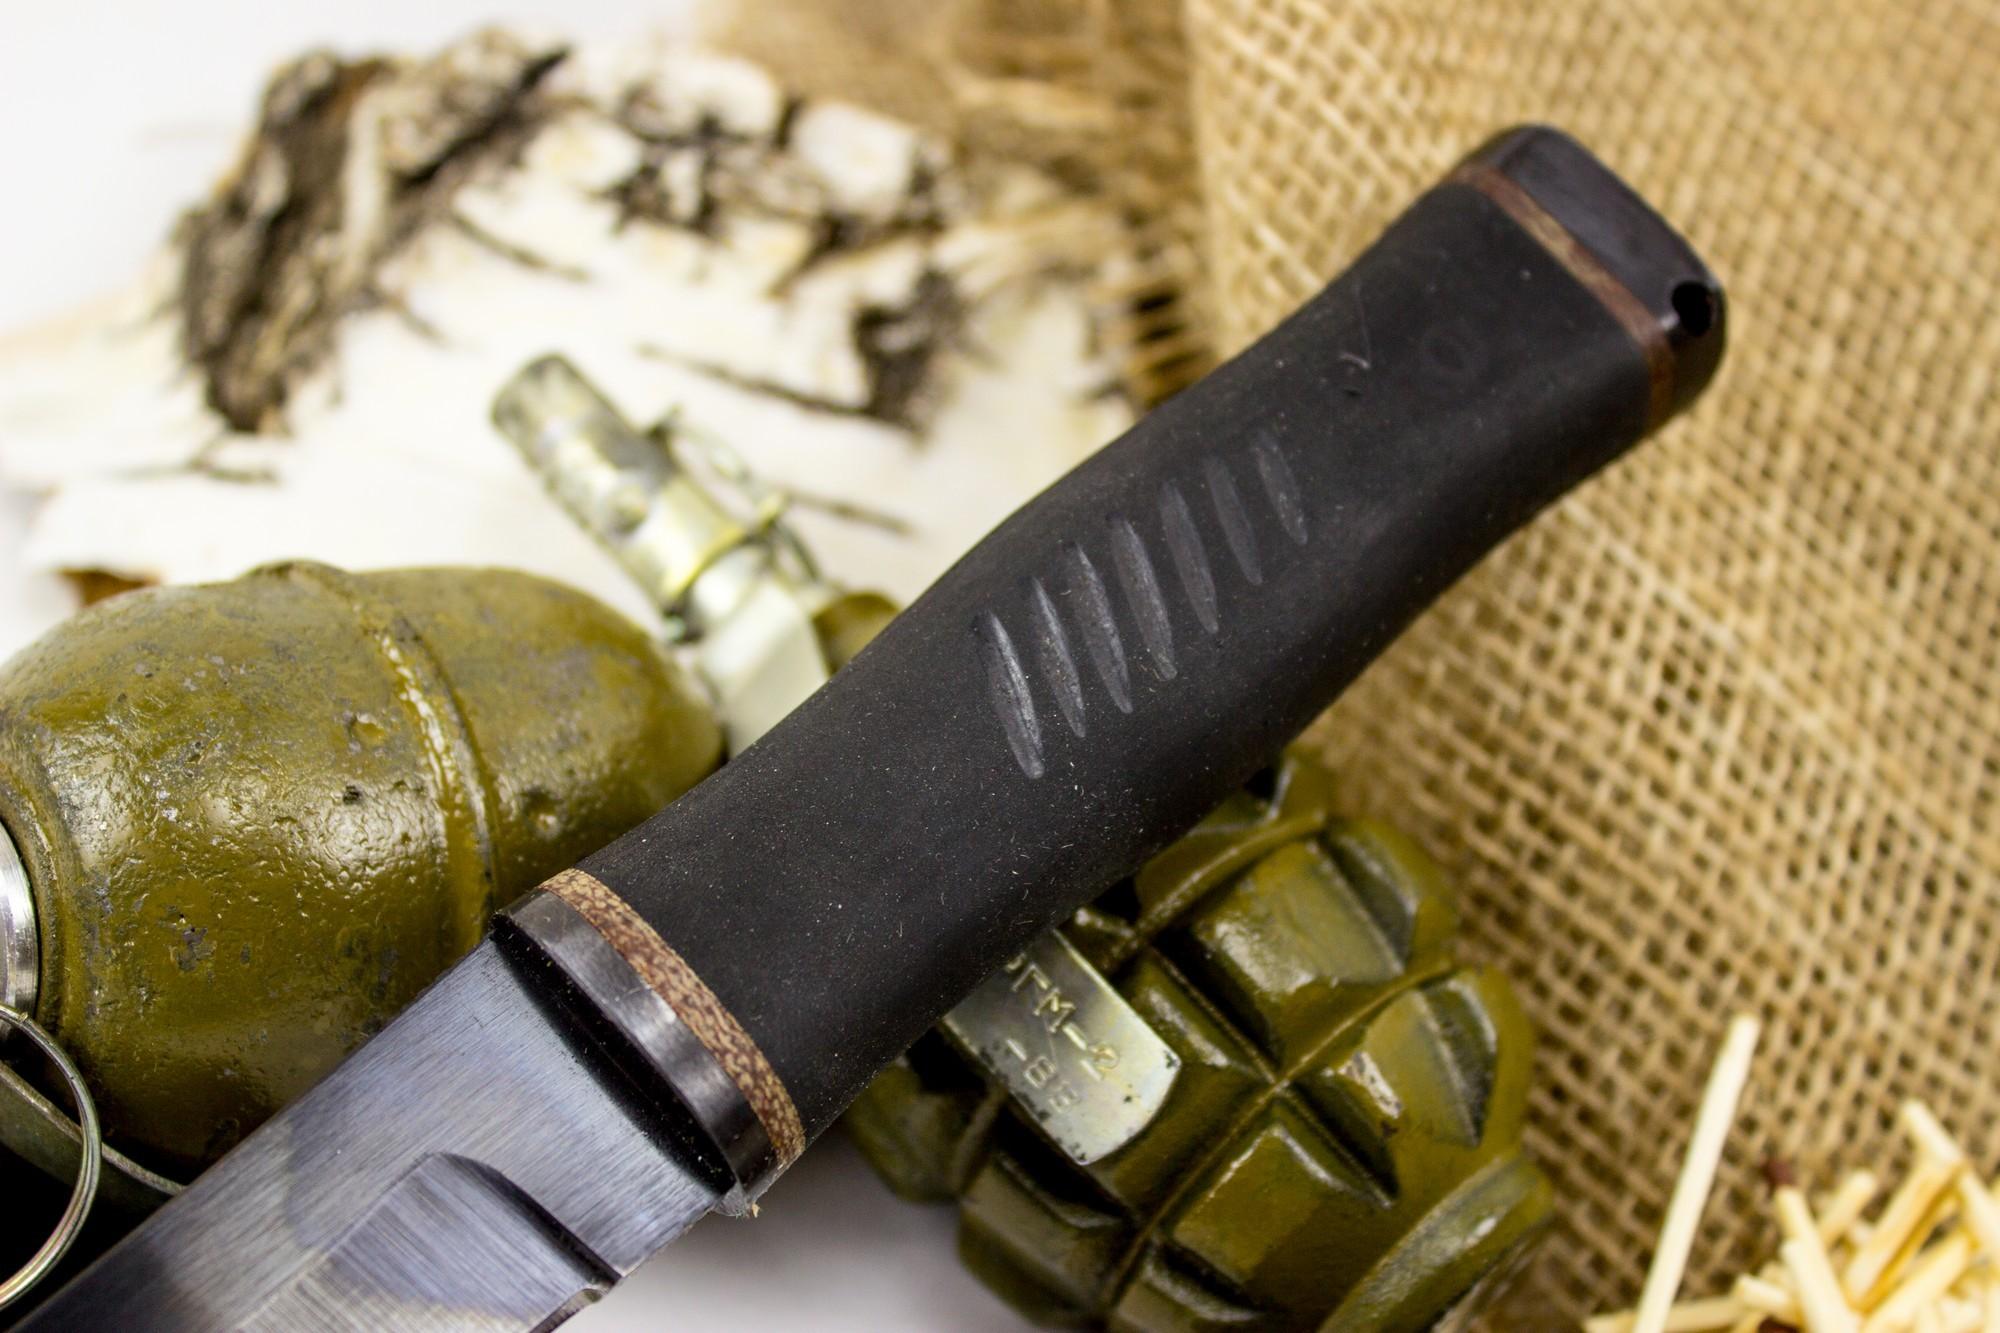 Фото 4 - Нож Кабан-1М, сталь 65Г, резина от Титов и Солдатова